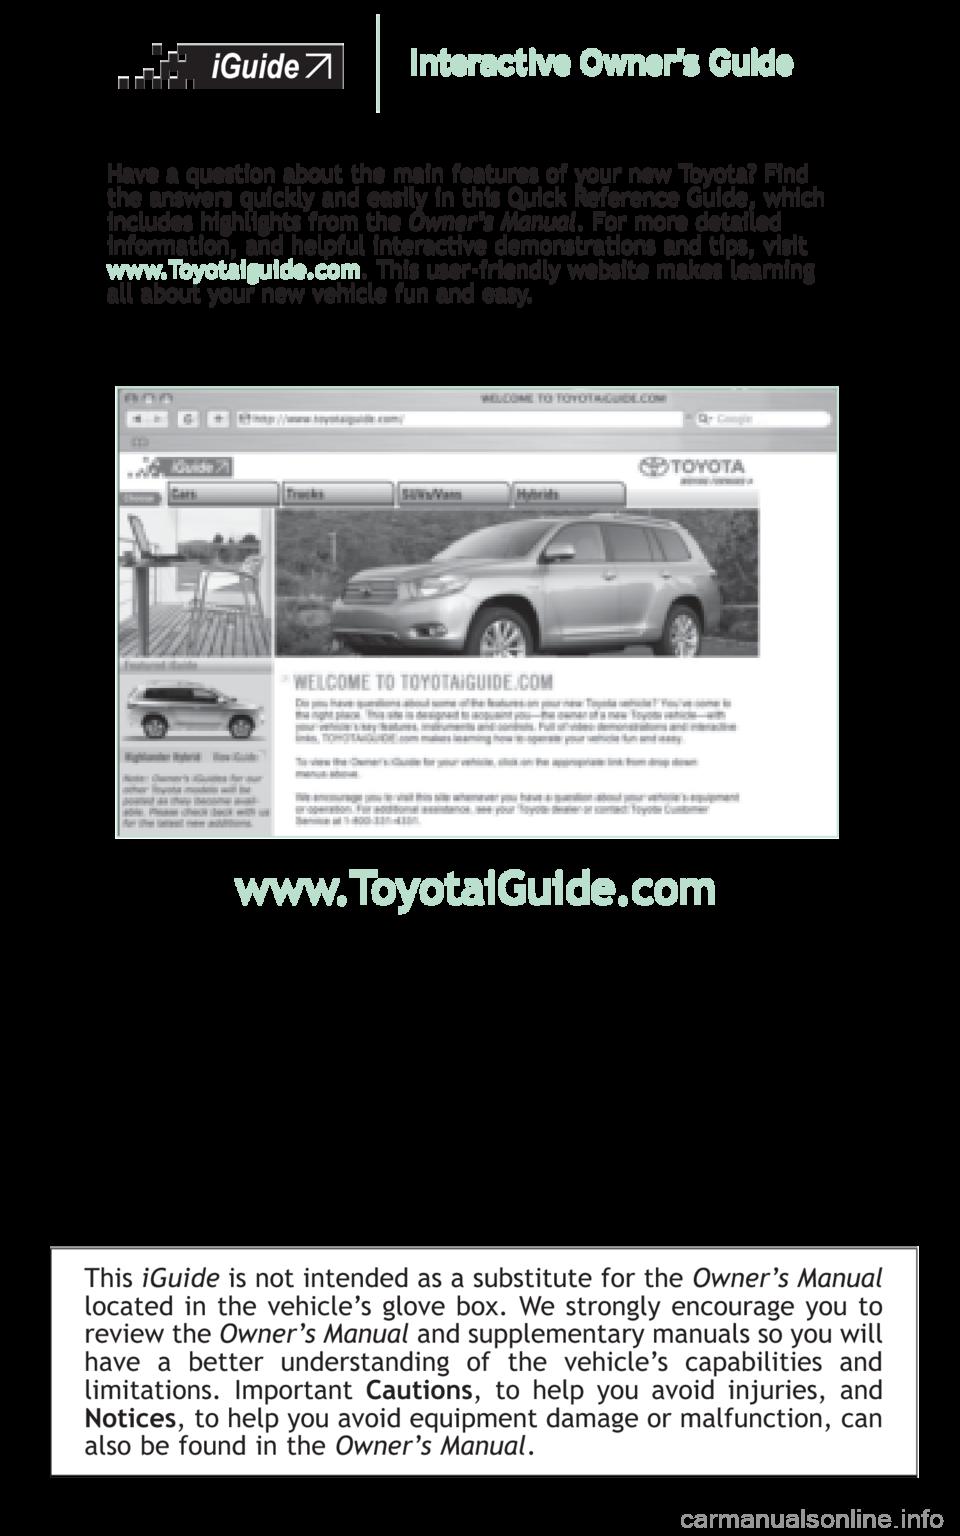 toyota highlander hybrid 2008 xu40   2 g quick reference guide 1999 Toyota Sienna Motor Manual 1999 Toyota Sienna Motor Manual